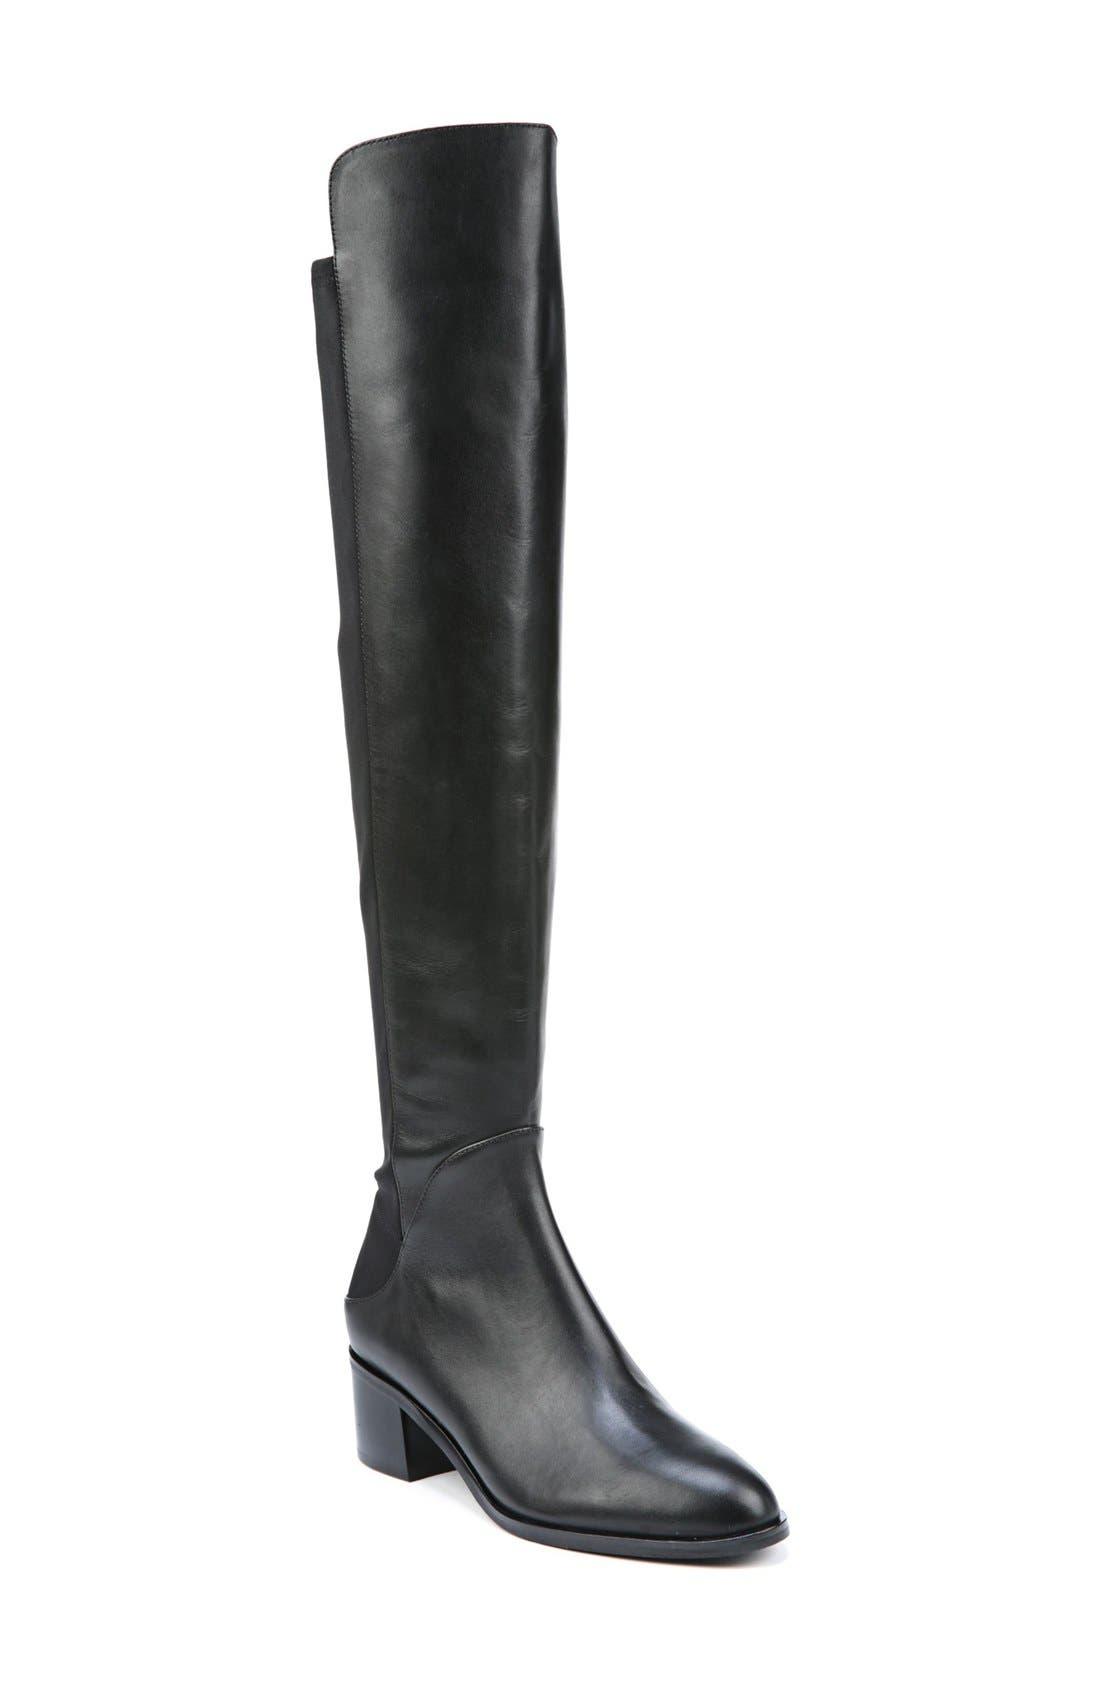 Alternate Image 1 Selected - Via Spiga 'Breanna' Over the Knee Boot